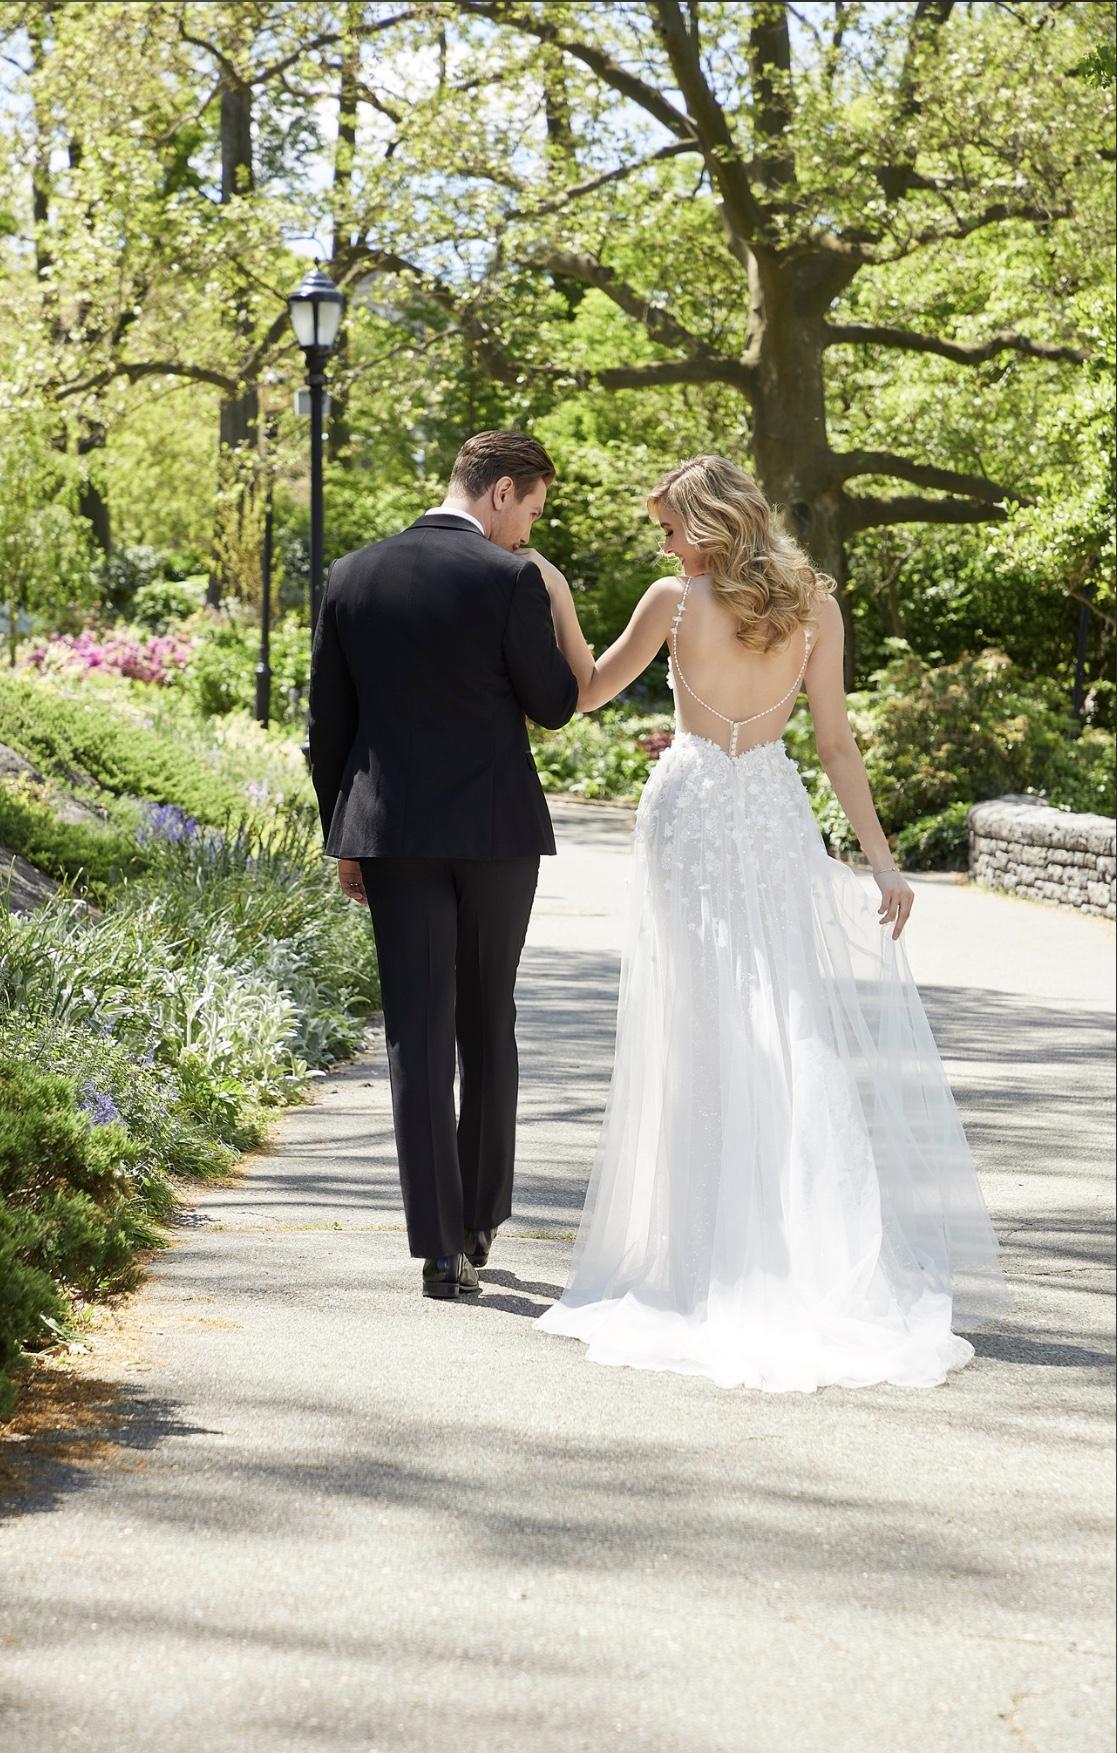 Bride in wedding dress with groom